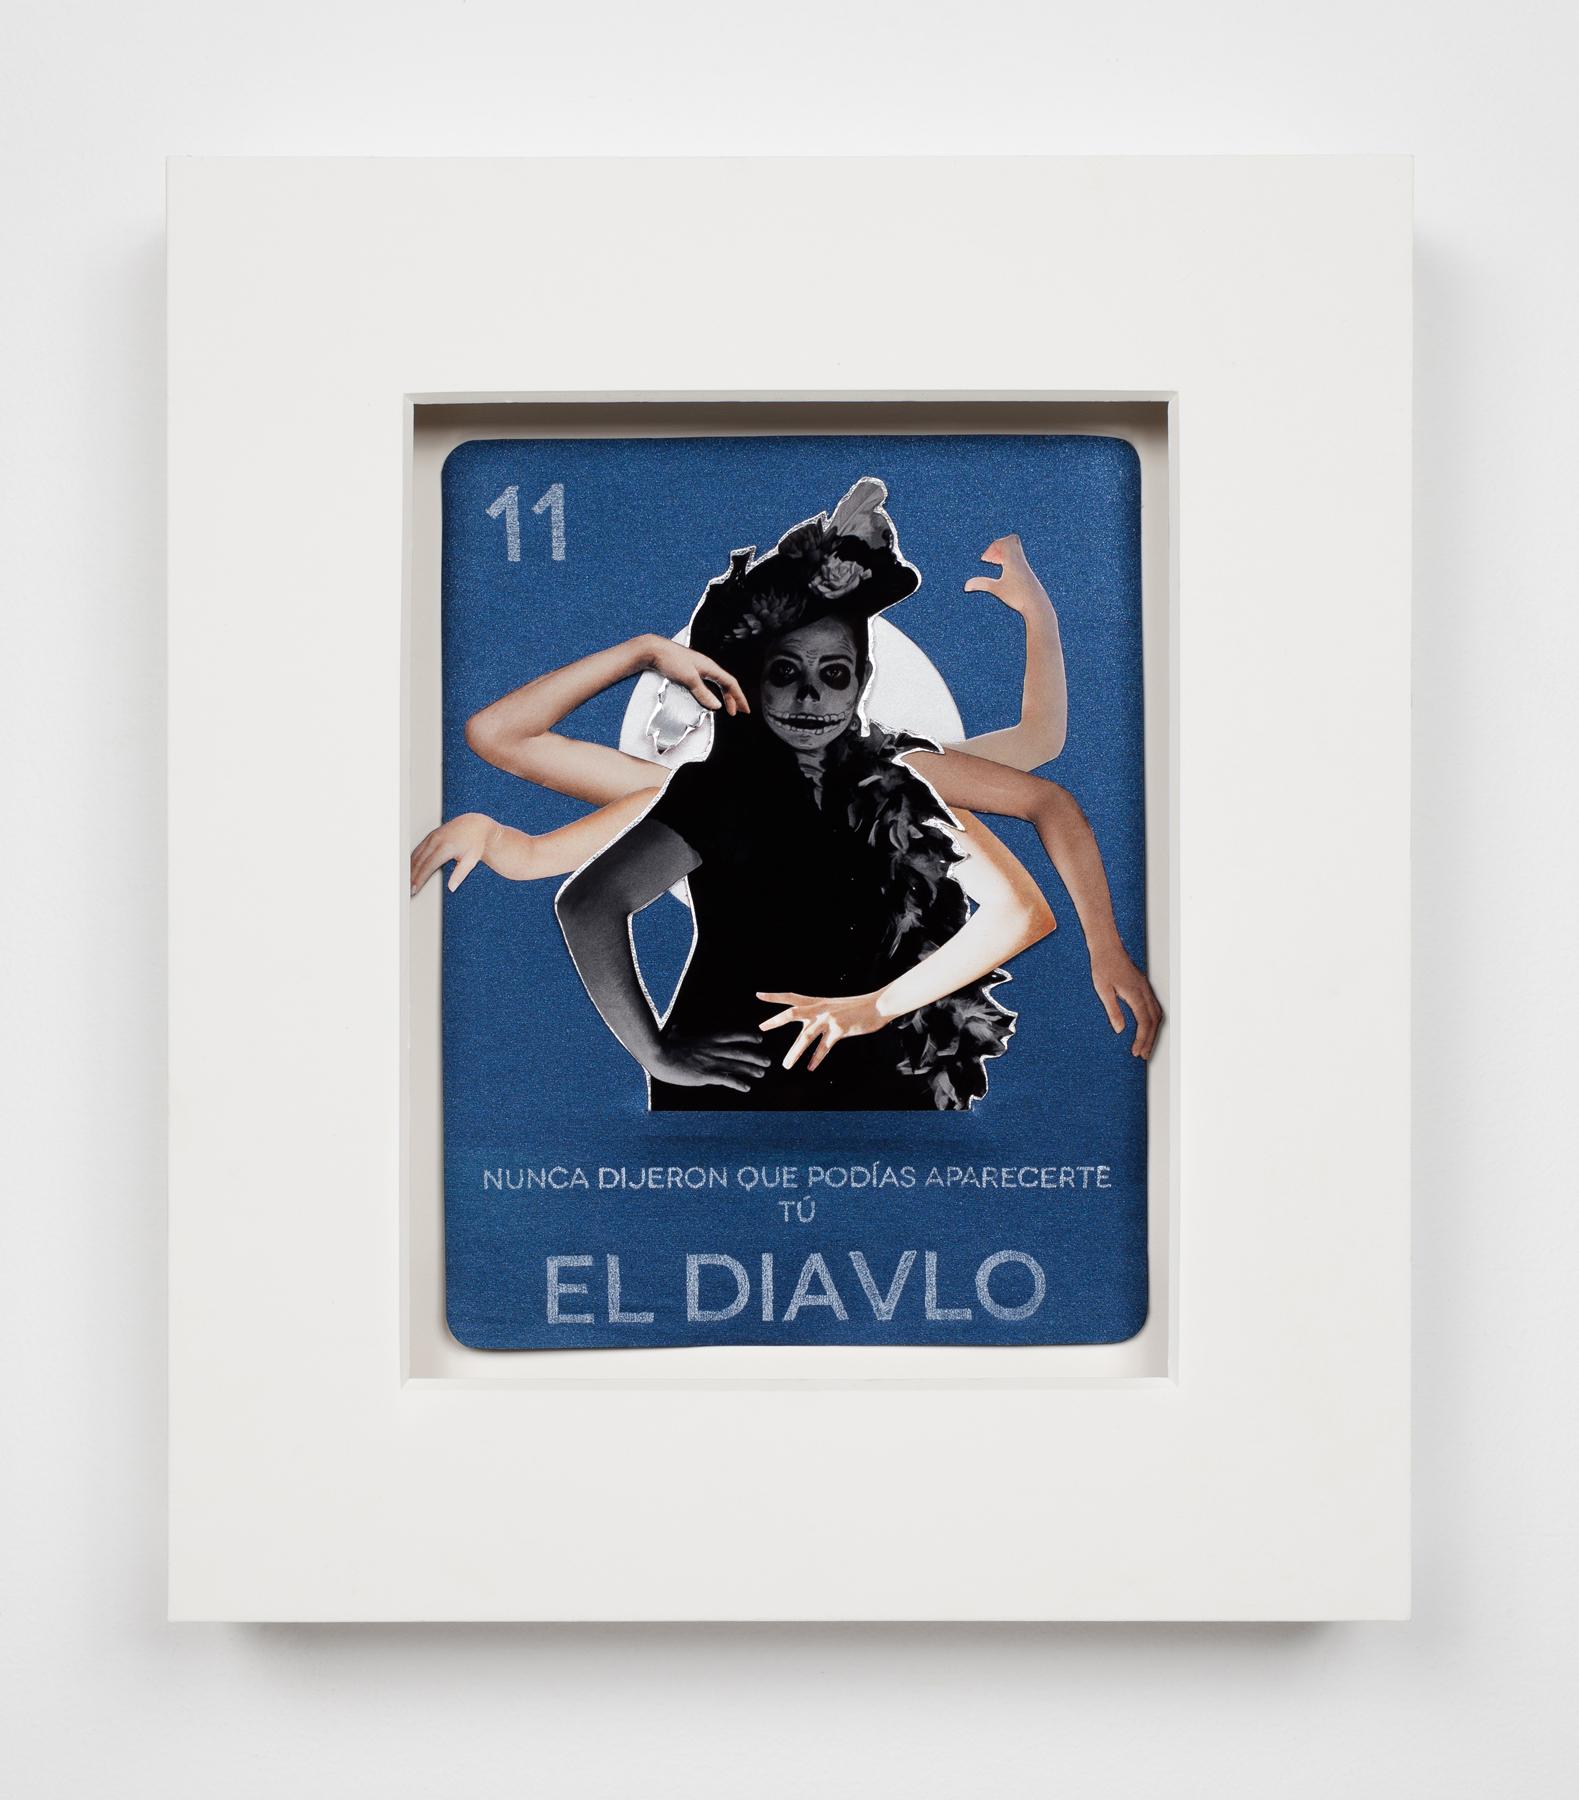 11 El Diavlo (The Devil)